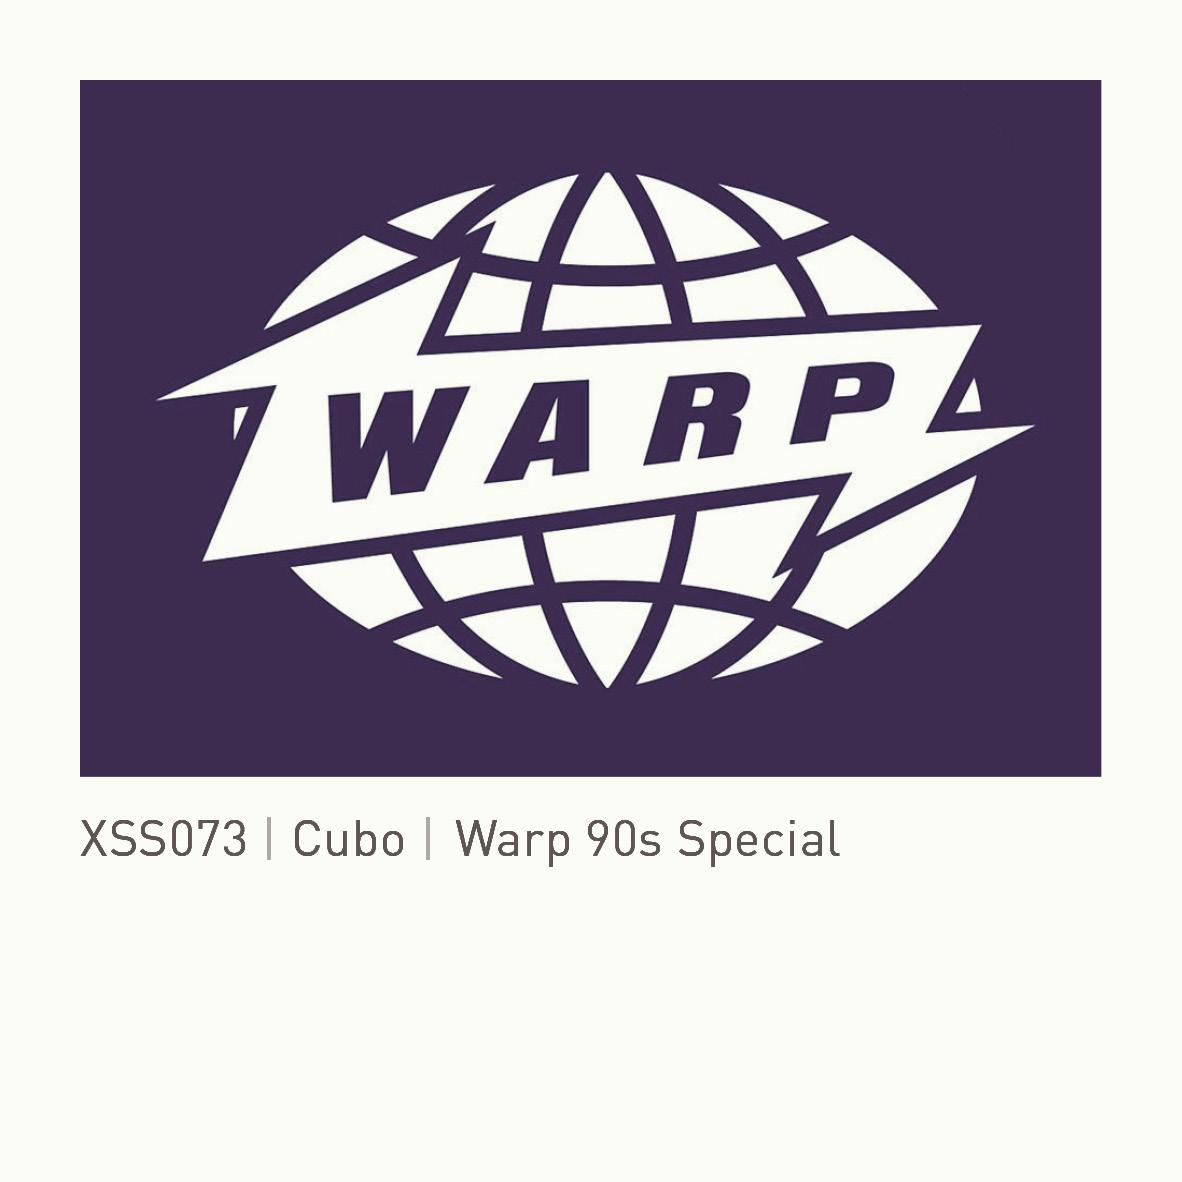 XSS073  |  Cubo  |  Warp  90s  Special